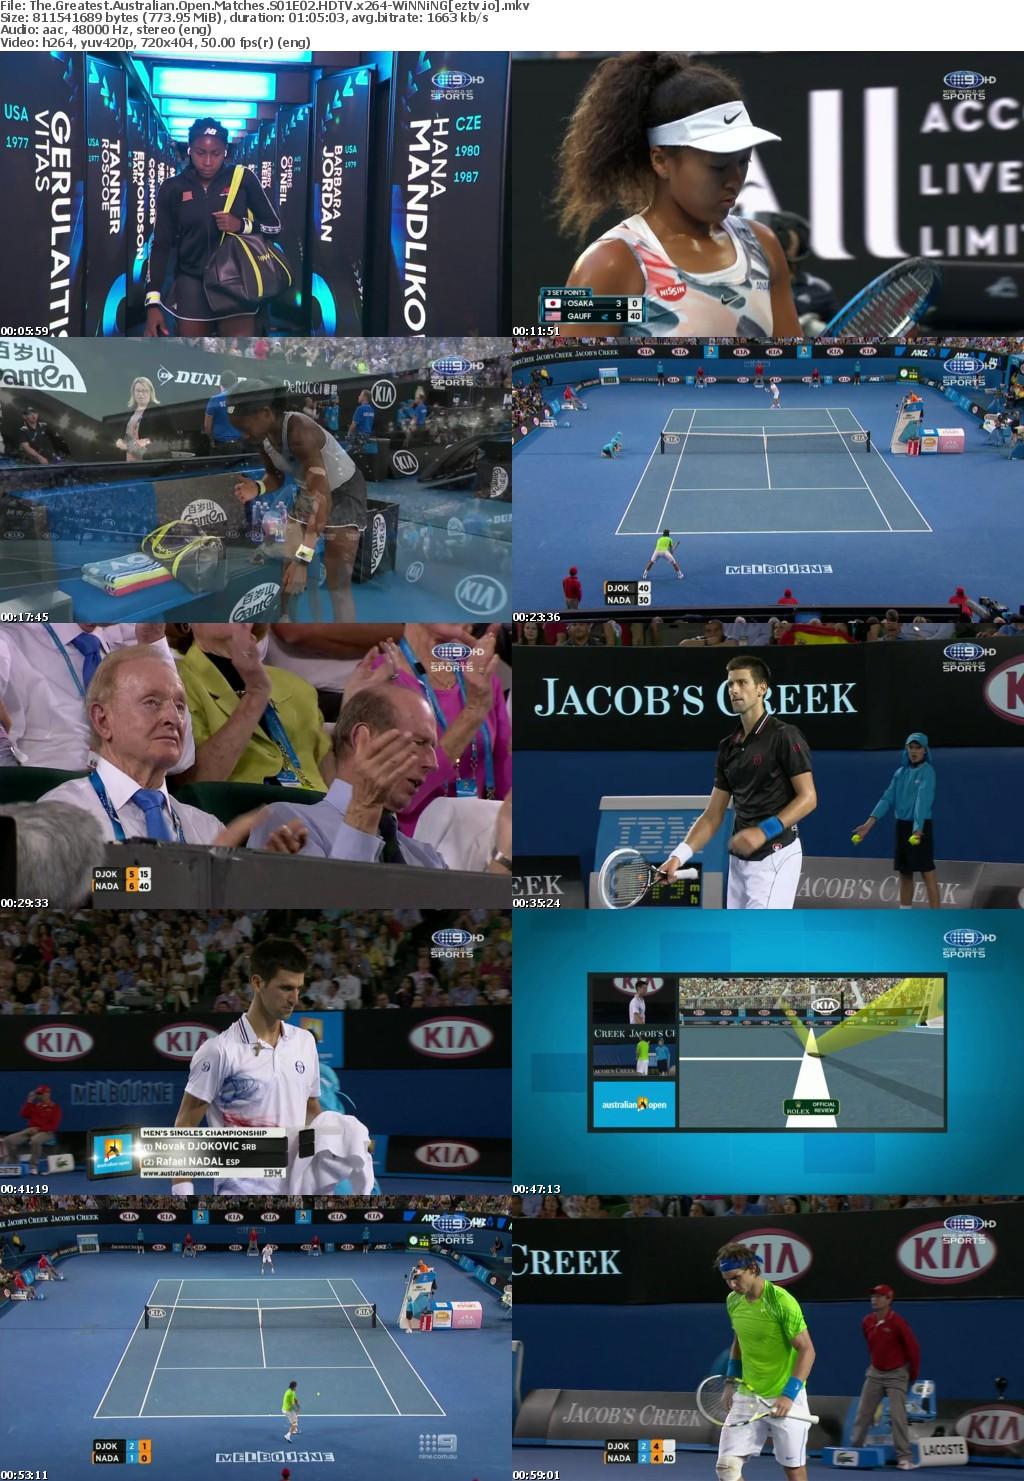 The Greatest Australian Open Matches S01E02 HDTV x264-WiNNiNG